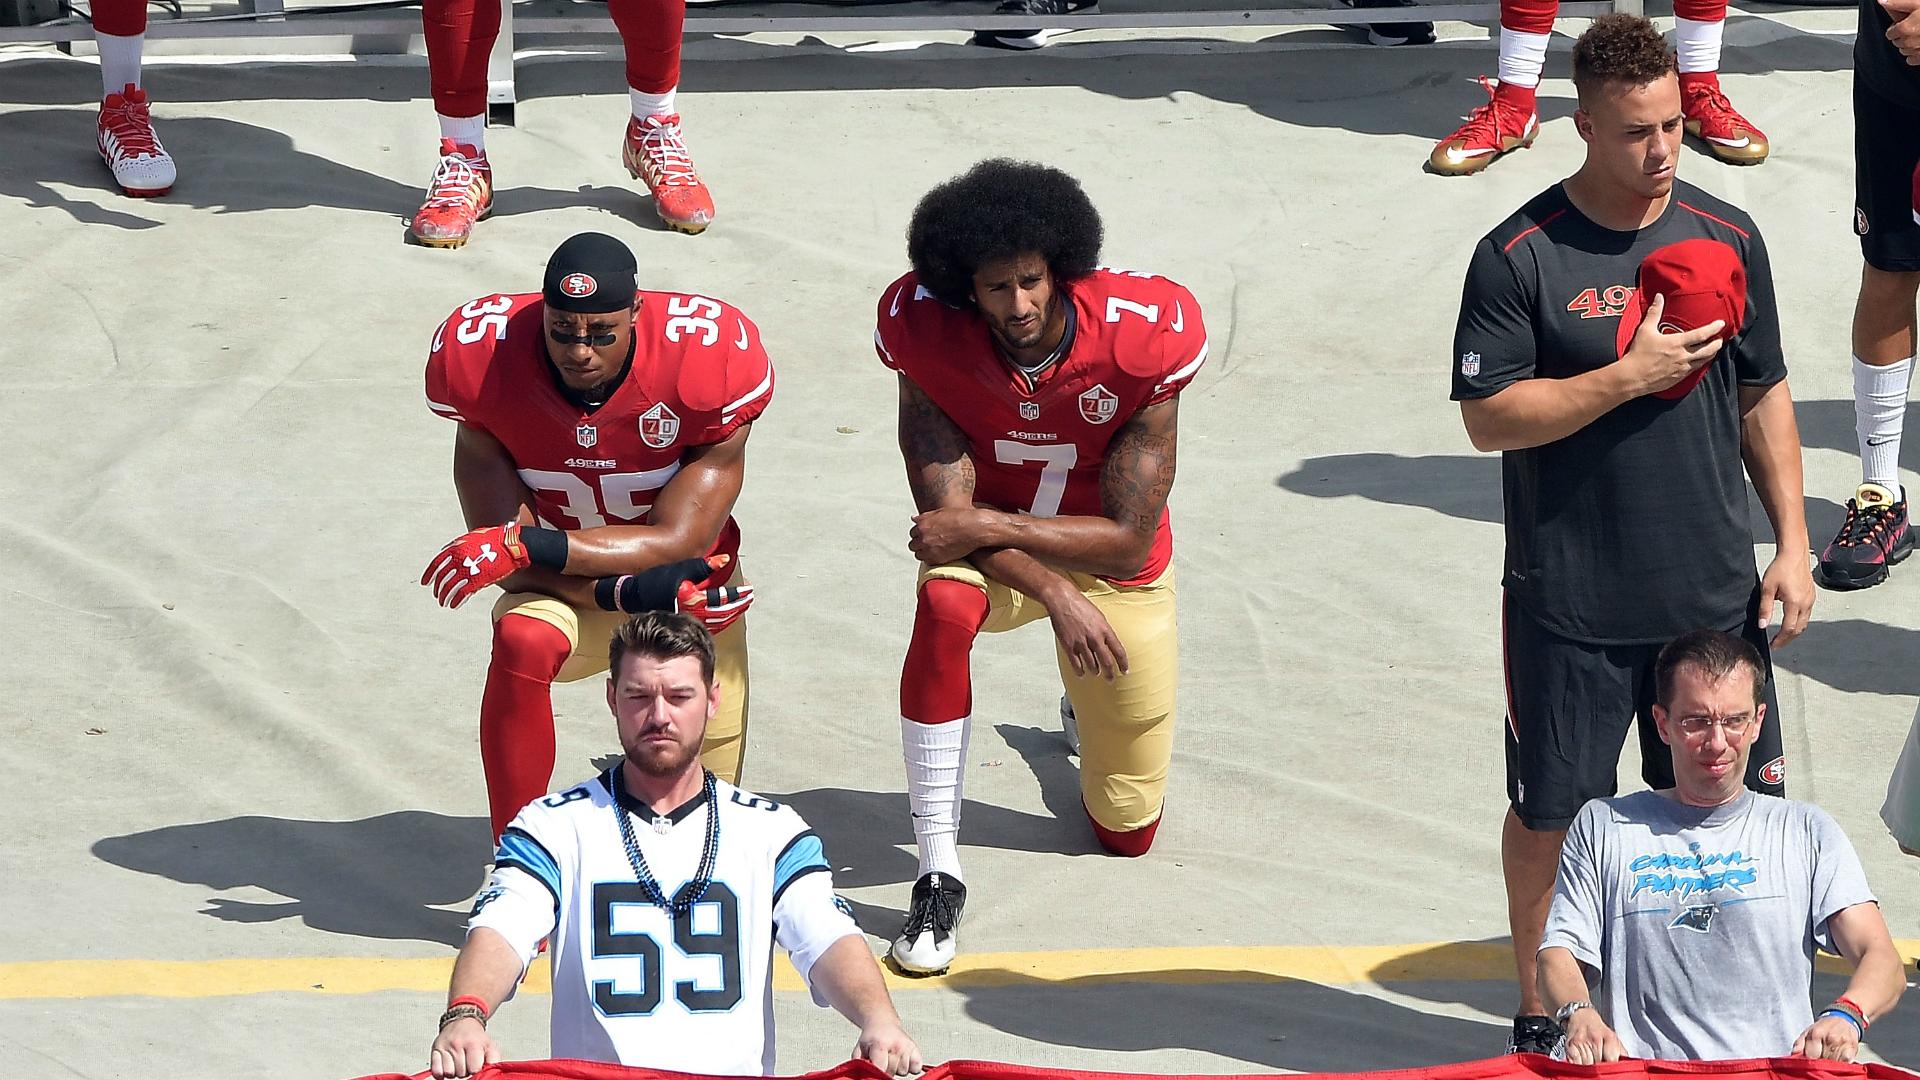 Colin Kaepernick vs. the NFL: A timeline of how we got here